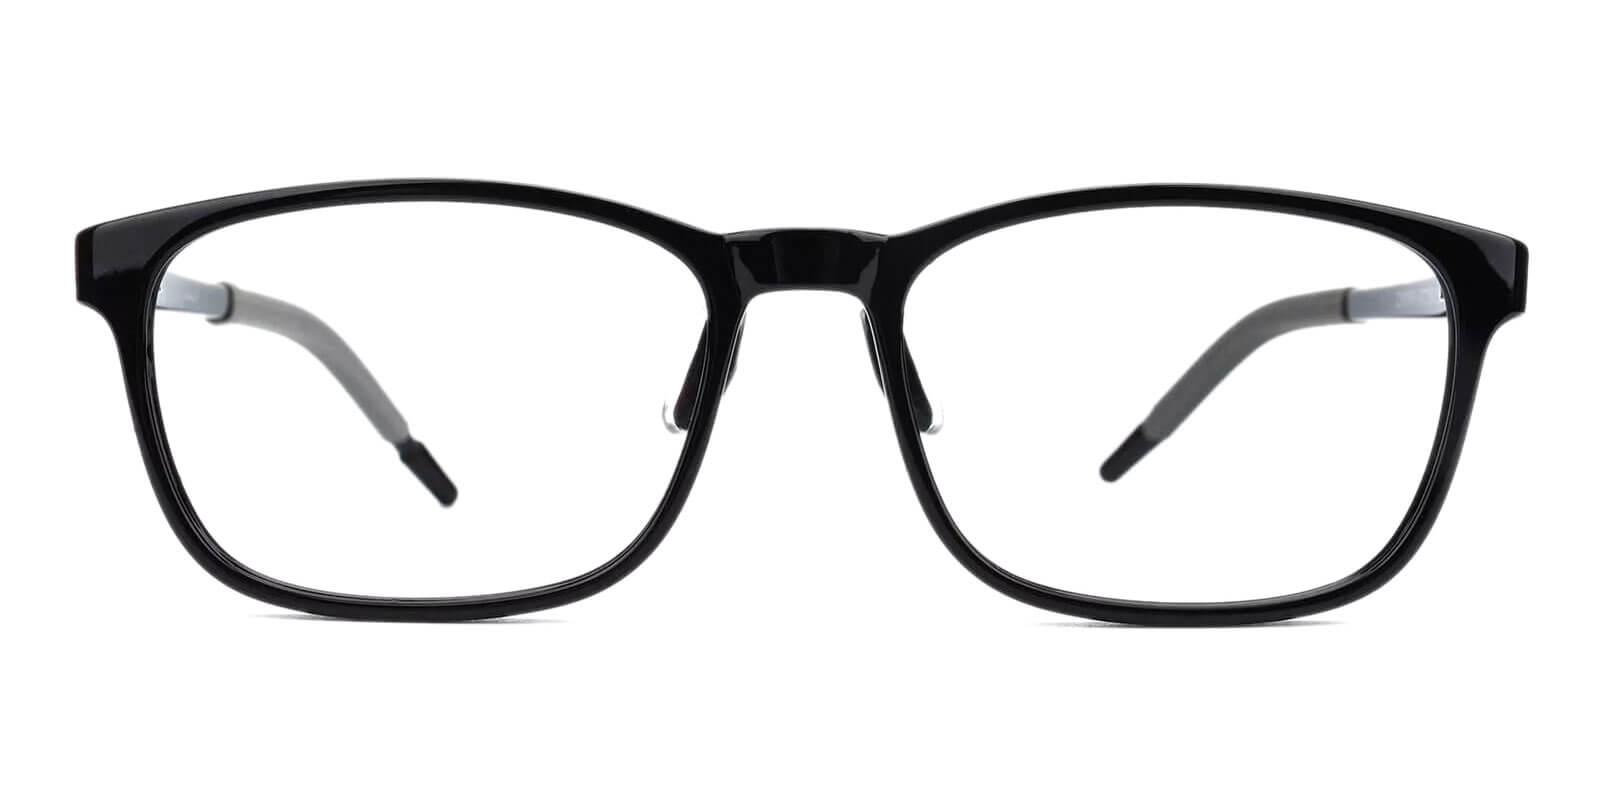 Sparkle Black Acetate , TR Eyeglasses , Lightweight , NosePads , UniversalBridgeFit Frames from ABBE Glasses